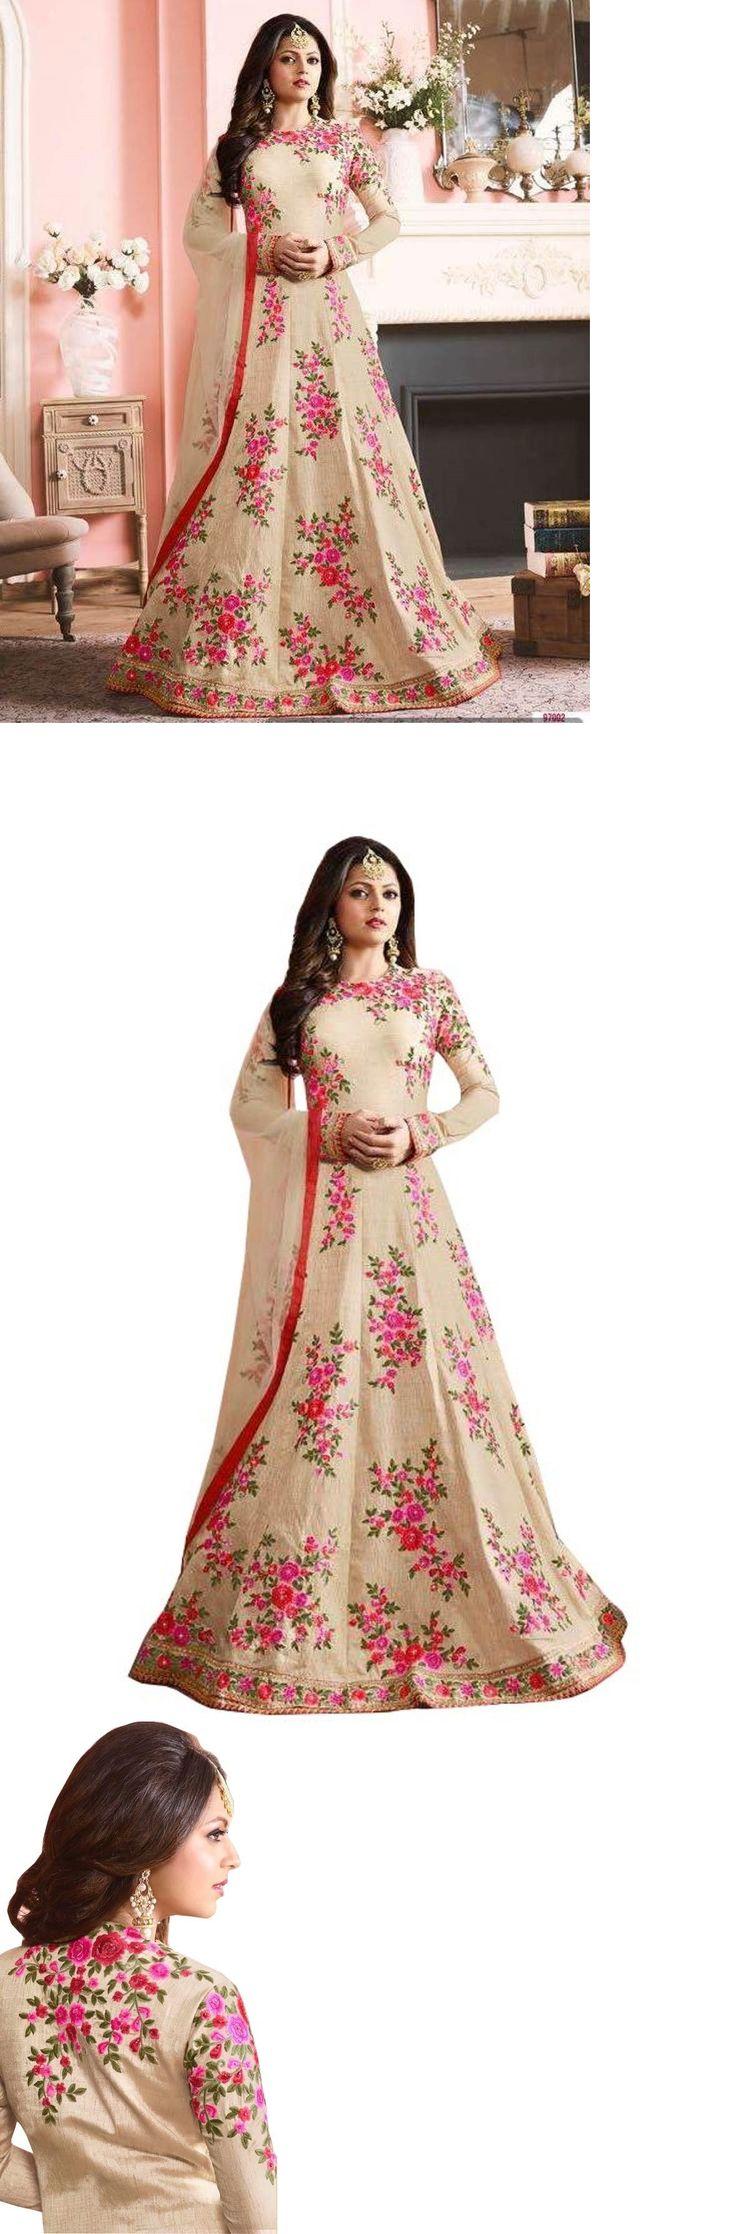 Choli 155247: Designer Party Wear Wedding Indian Pakistani Saree Sari Bollywood Ethnic Suit -> BUY IT NOW ONLY: $44.99 on eBay!